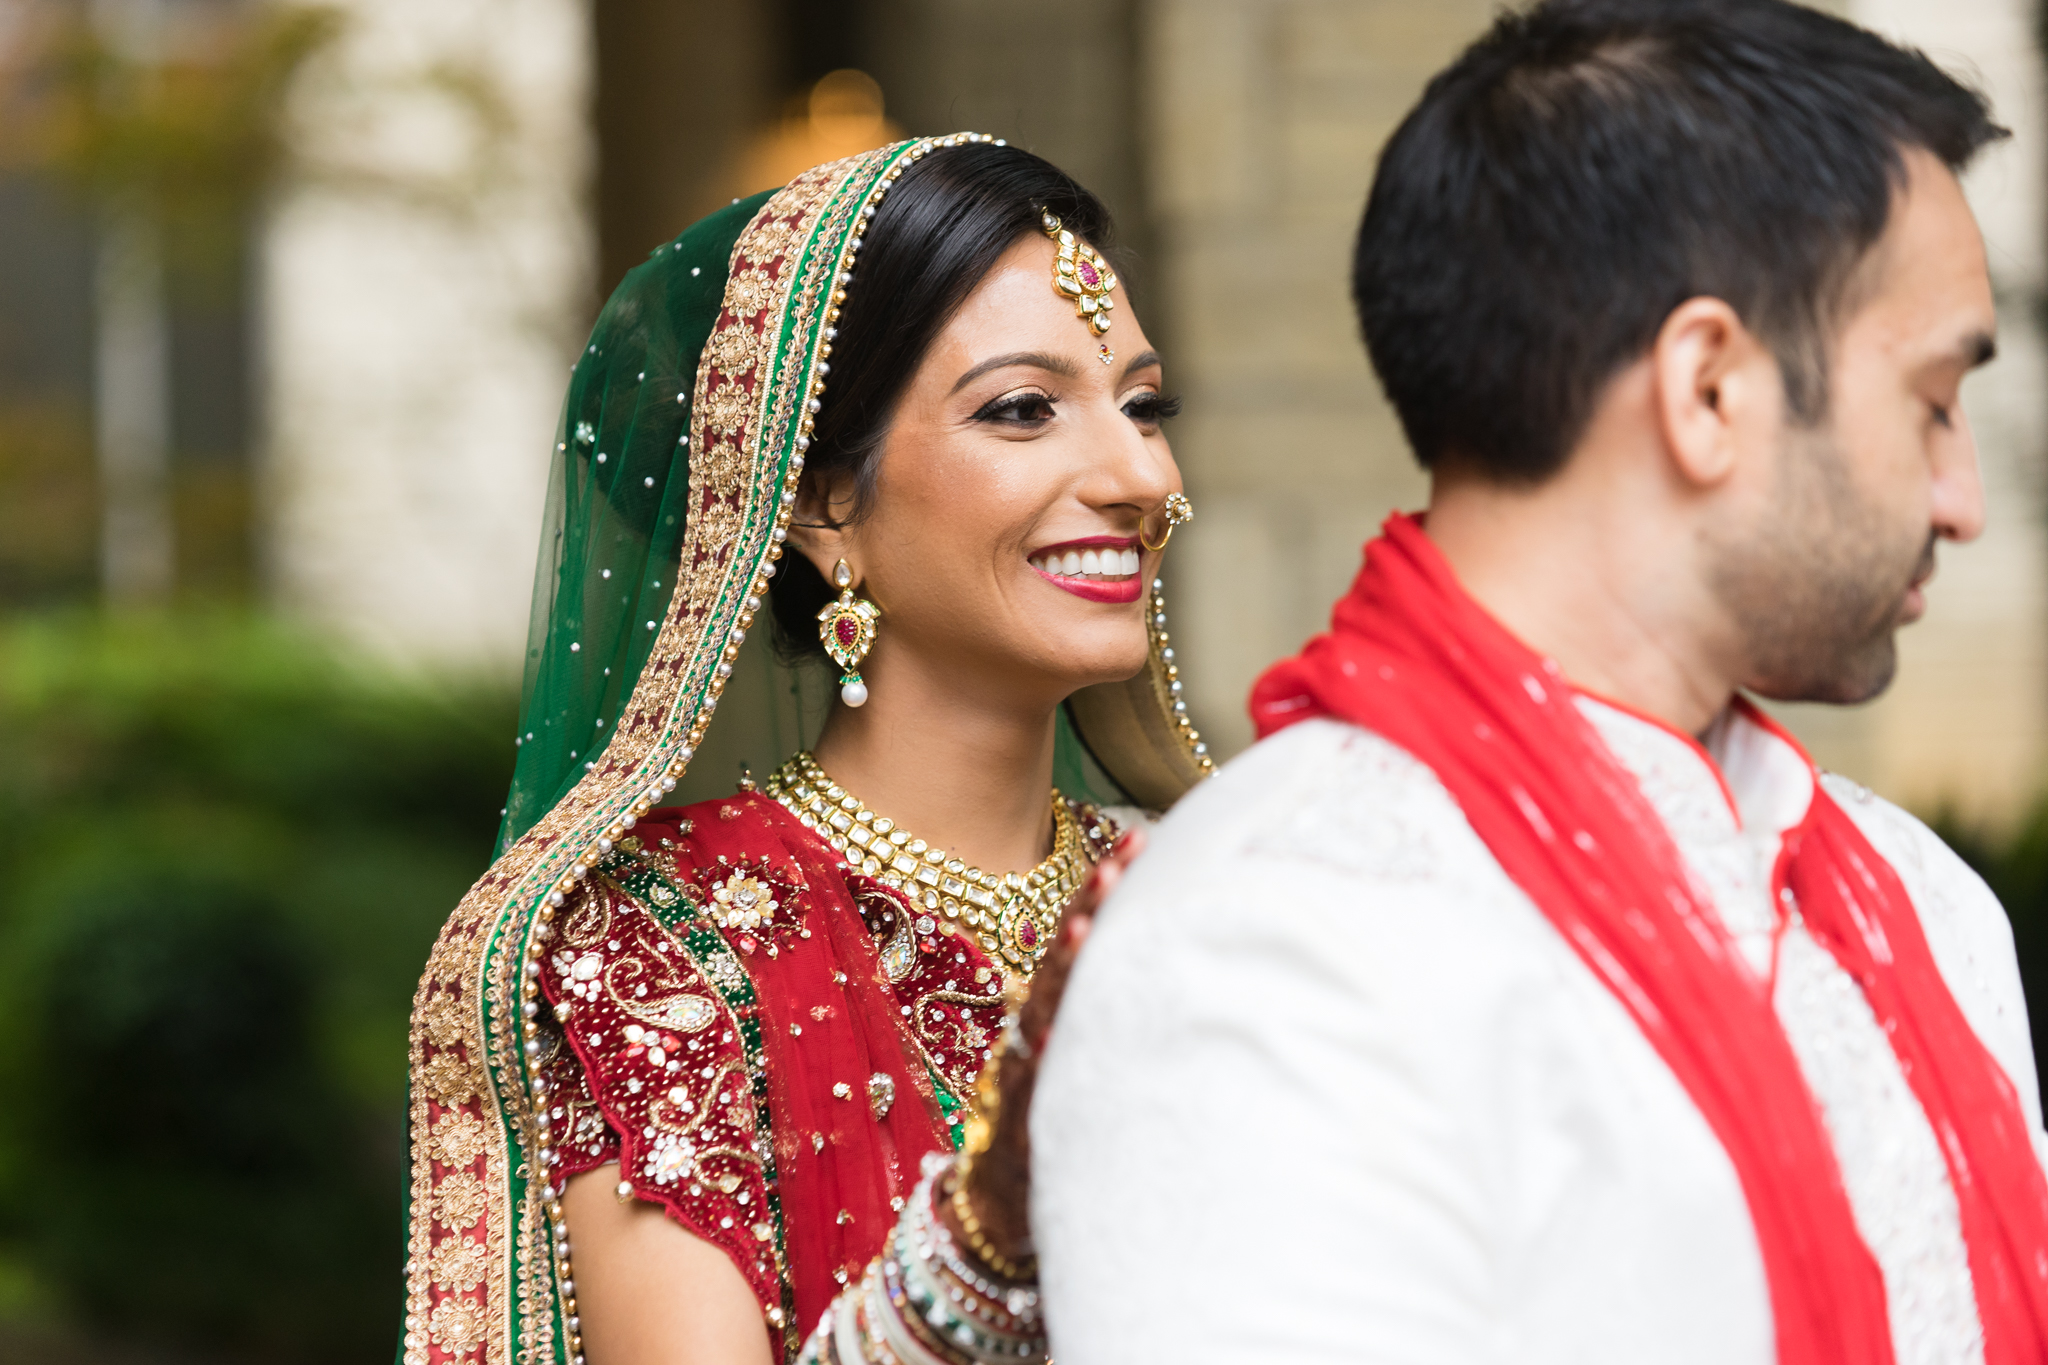 ReeyaAman-Wedding-Photography-www.MnMfoto.comMnMfoto-Krishna-Sajan-784.jpg